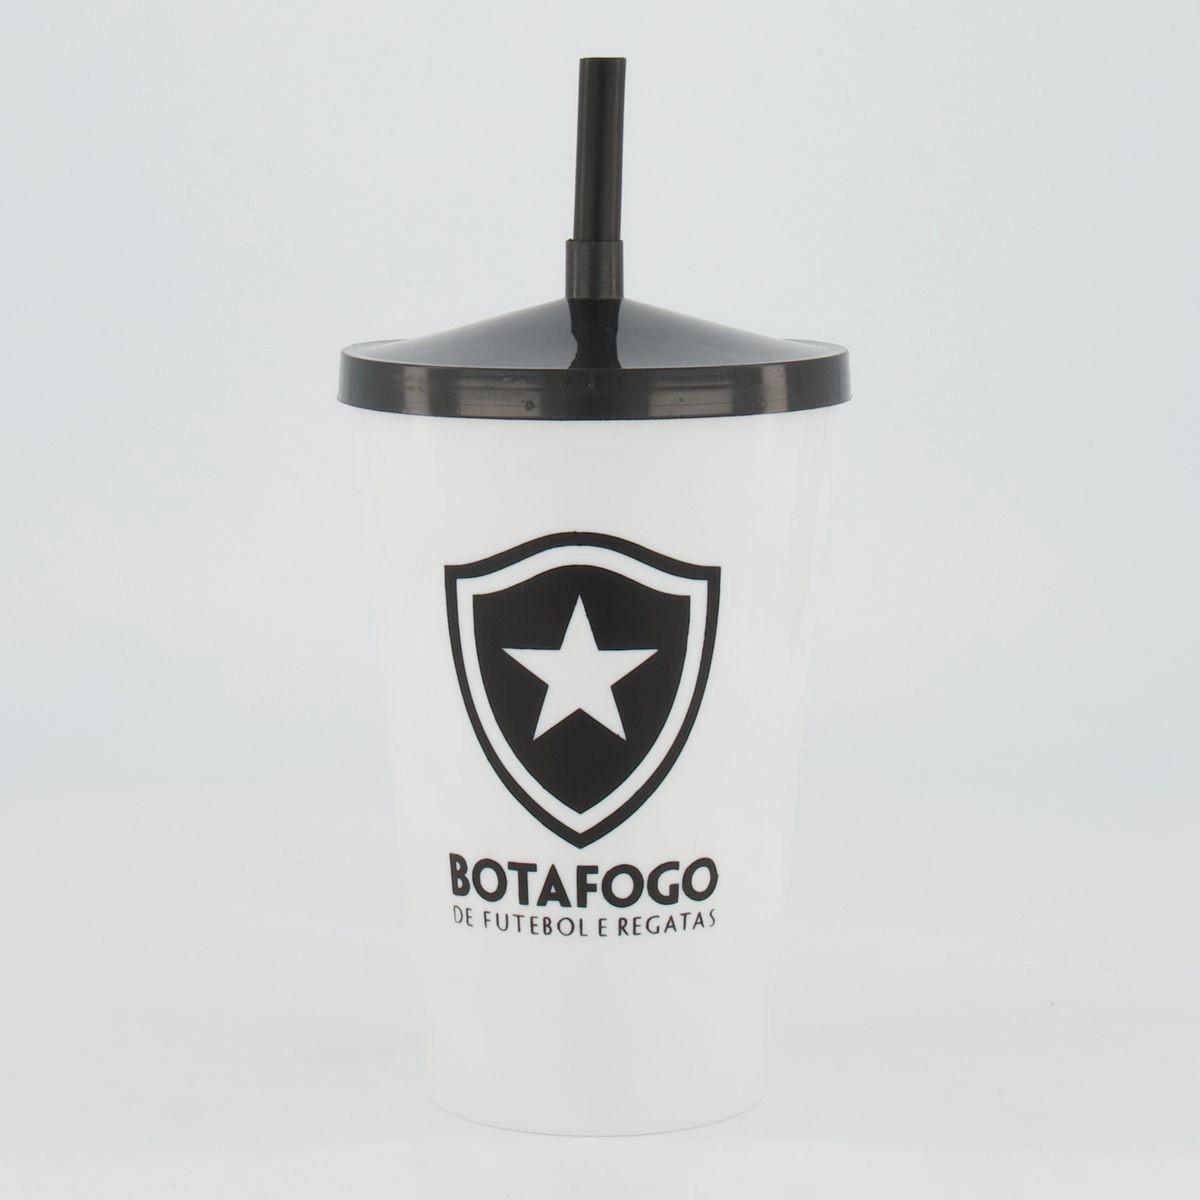 Copo Plástico Botafogo 800ml Branco e Preto